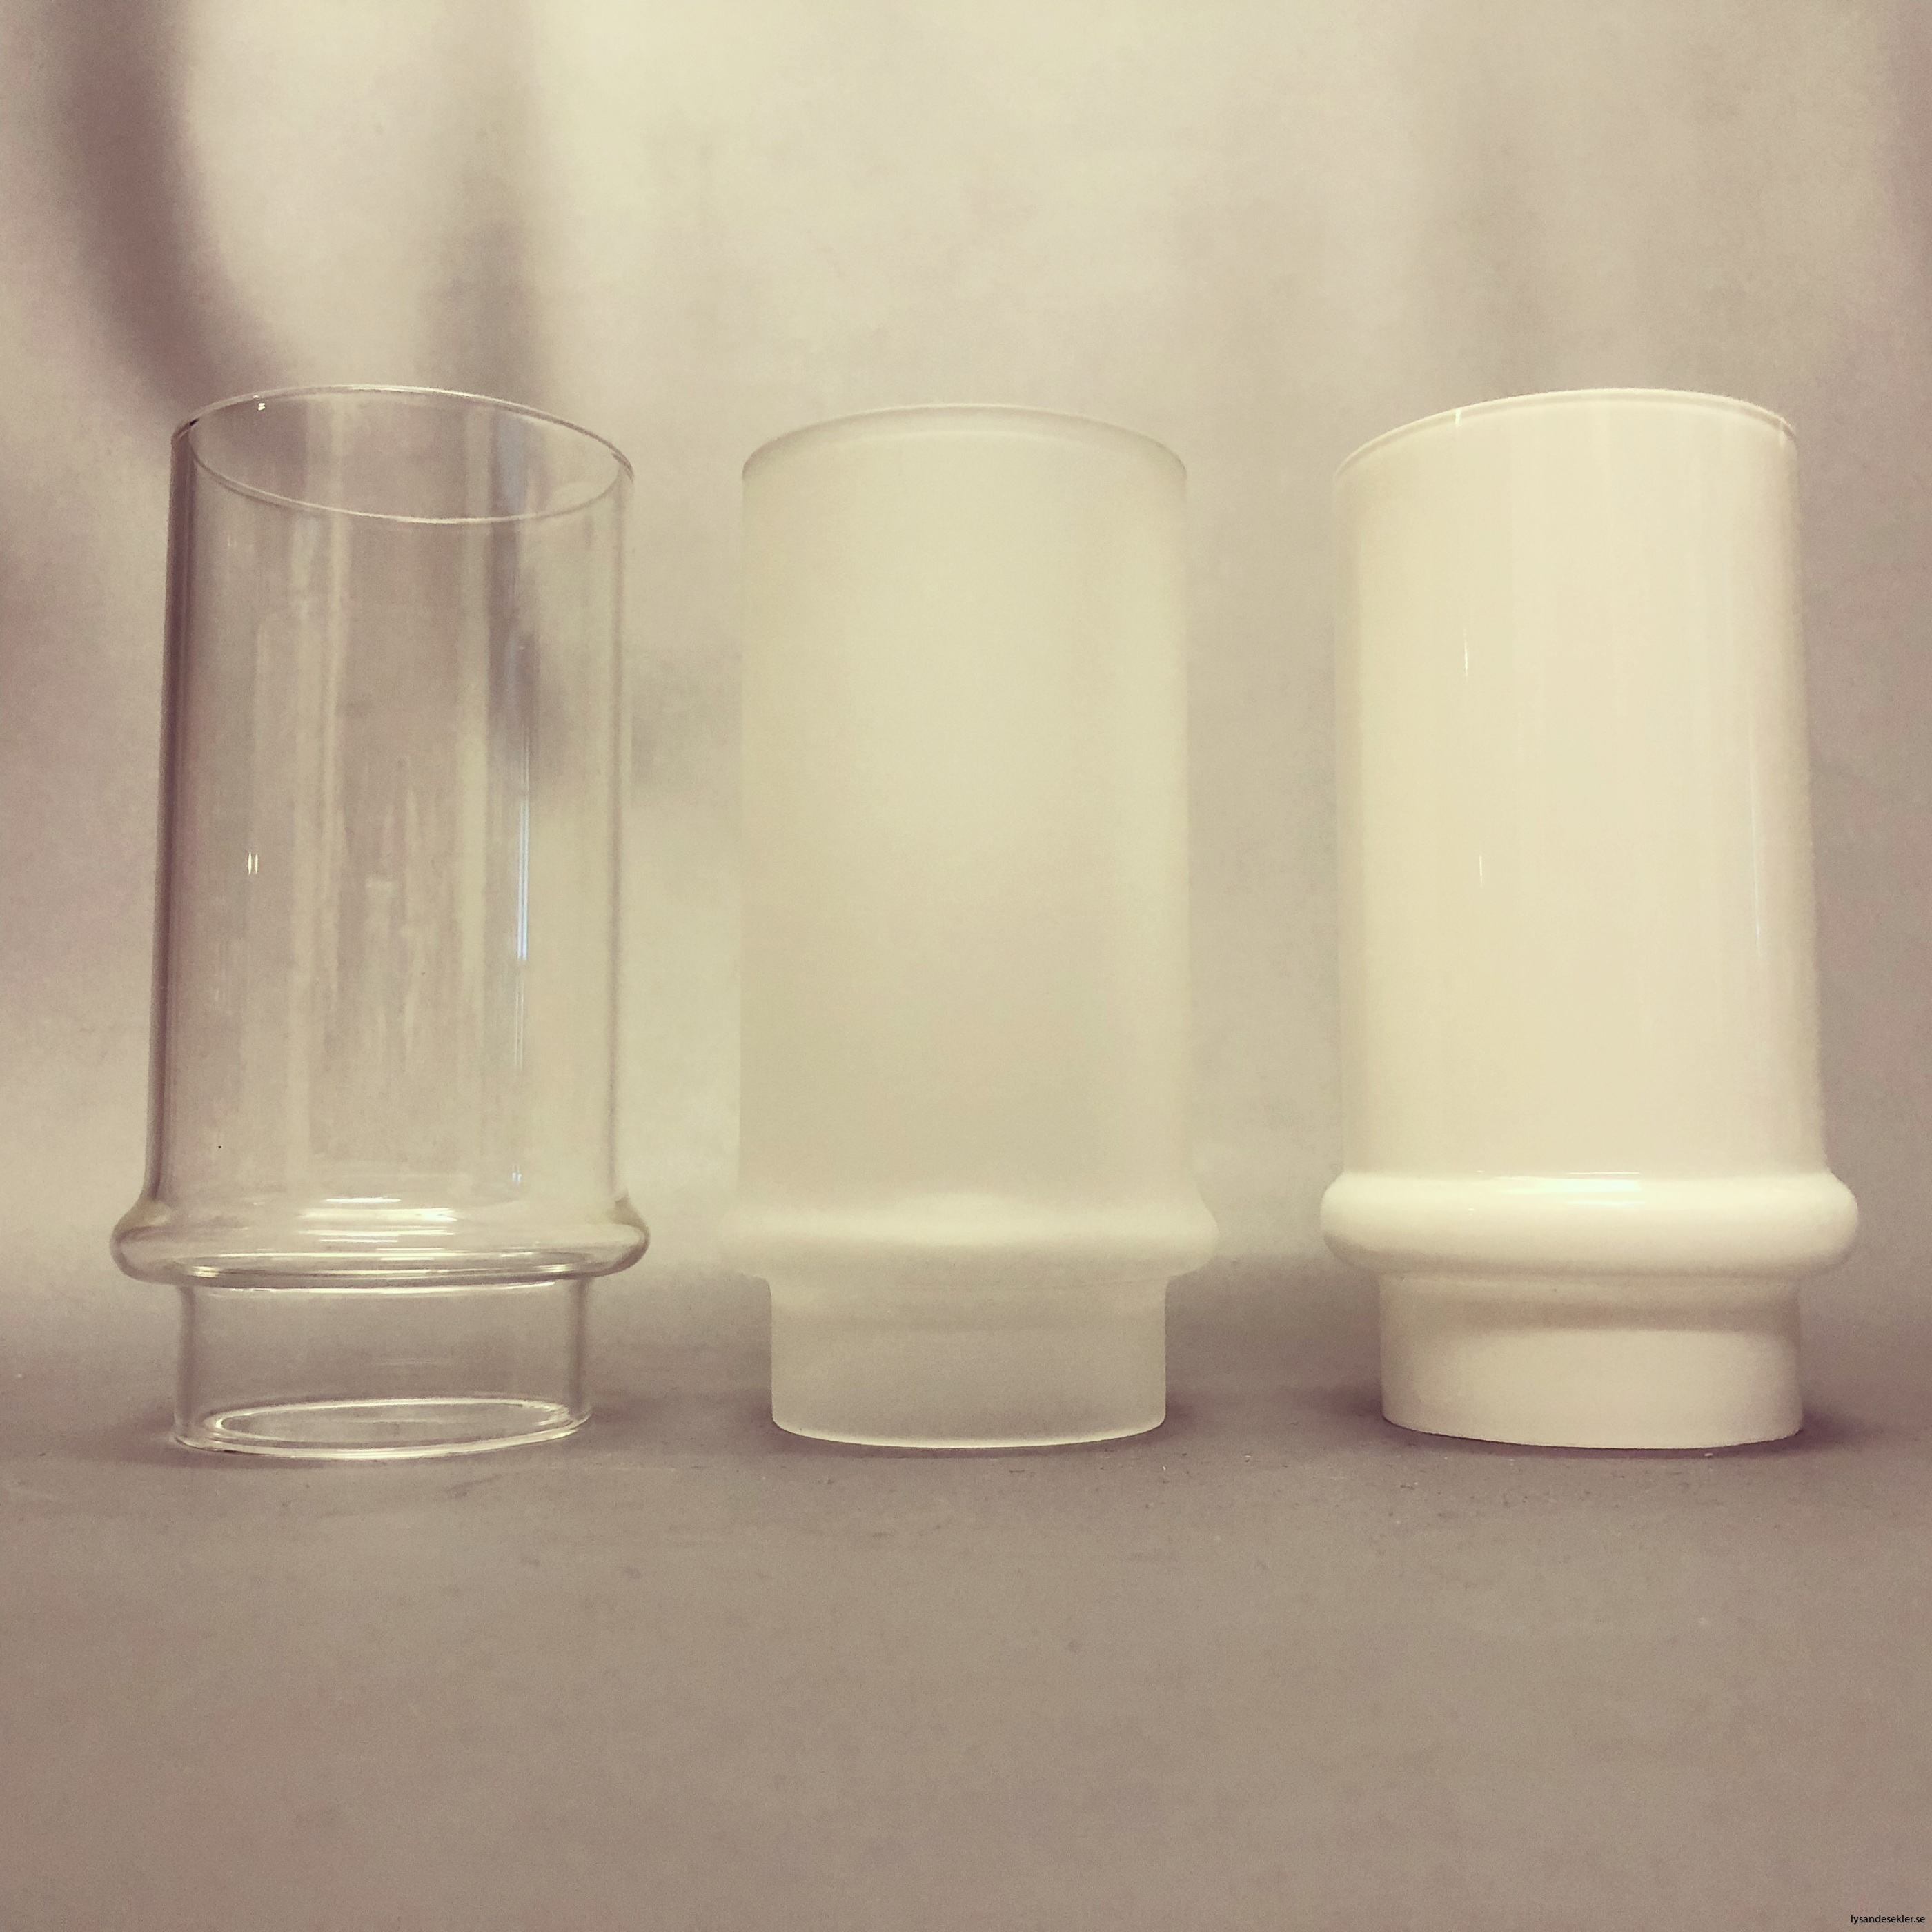 ellipse glas till oljelampa2